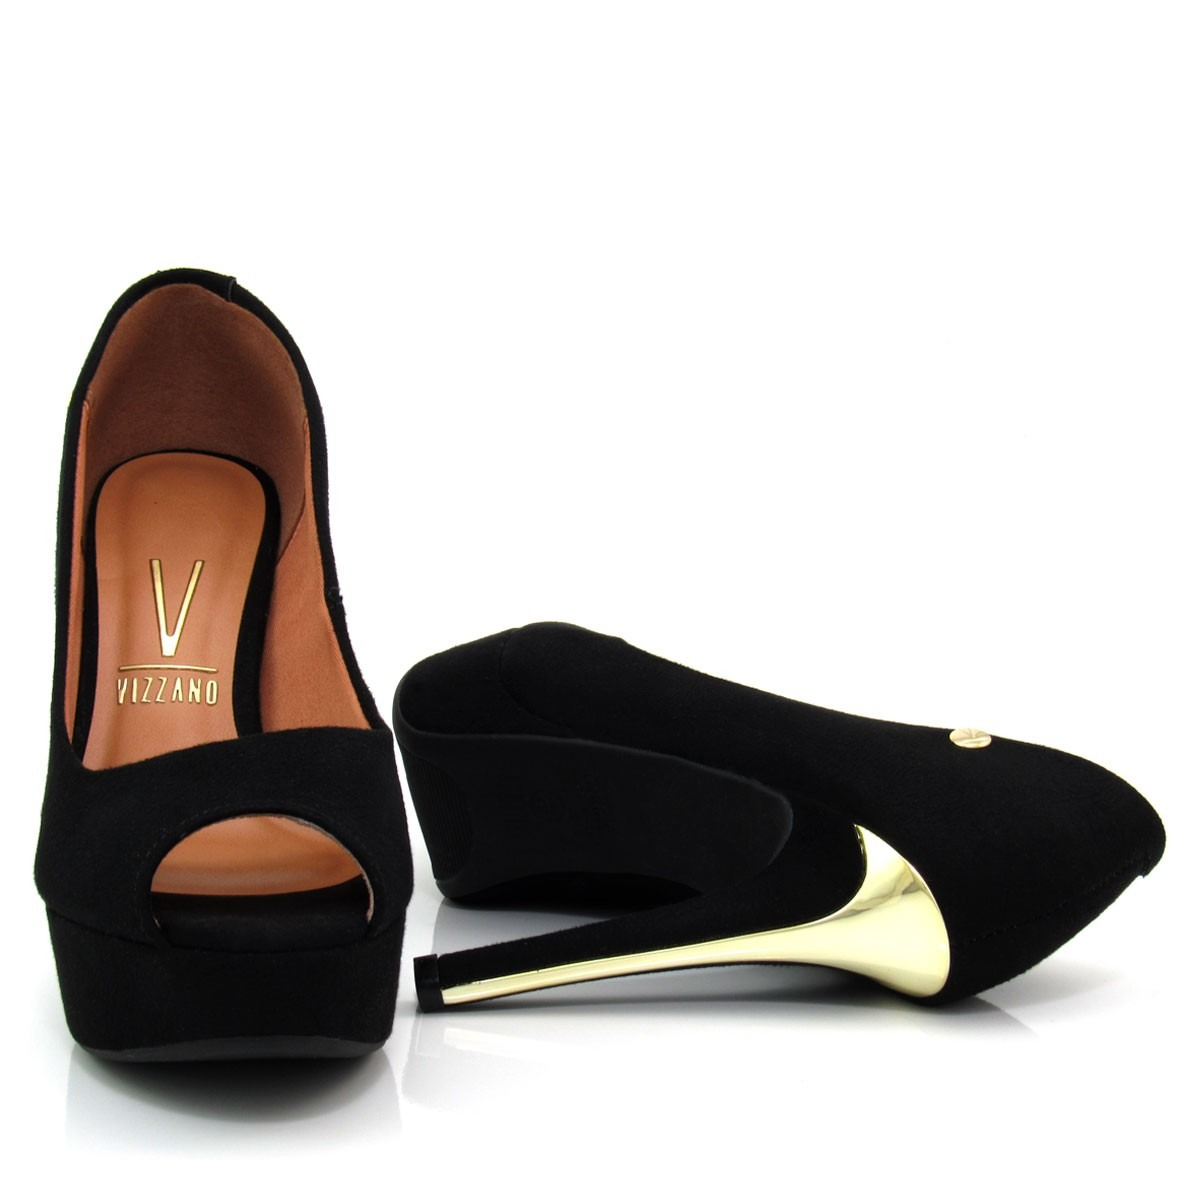 ef7481f10 Sapato Feminino Peep Toe Vizzano 1830100 Camurça - R  69